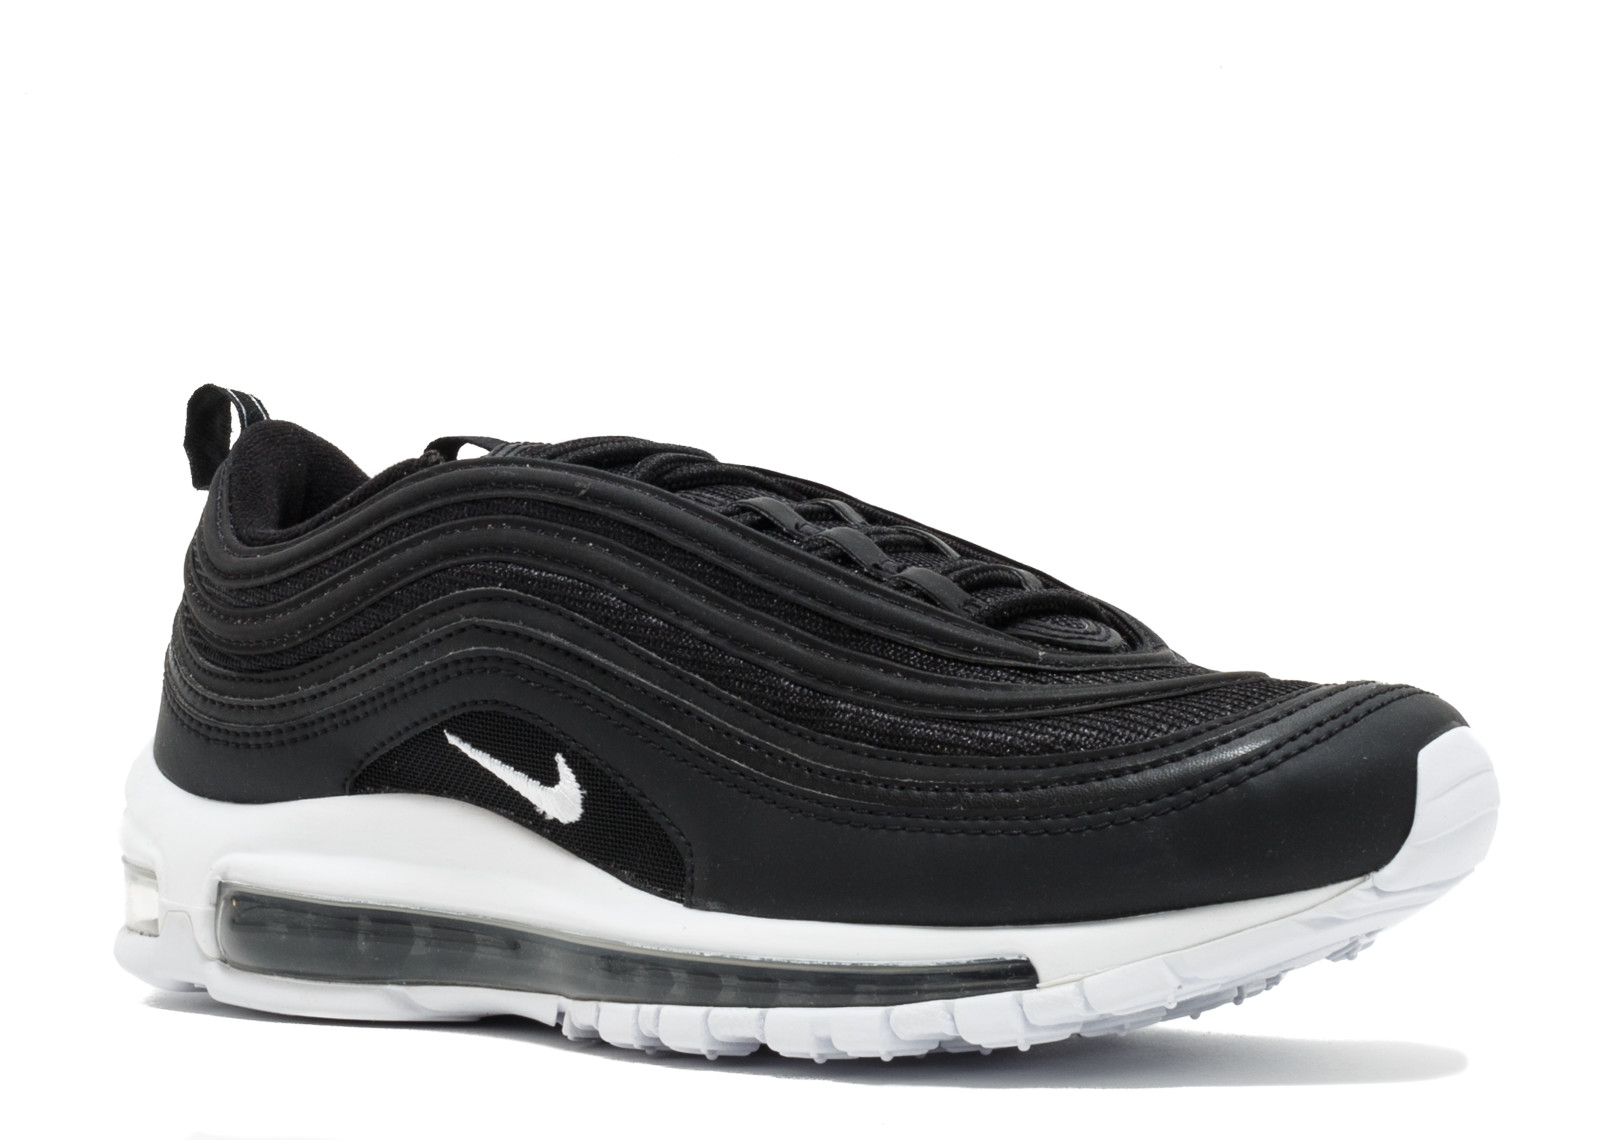 Nike Air Max 97 921826 001 Size 10 5 Ebay